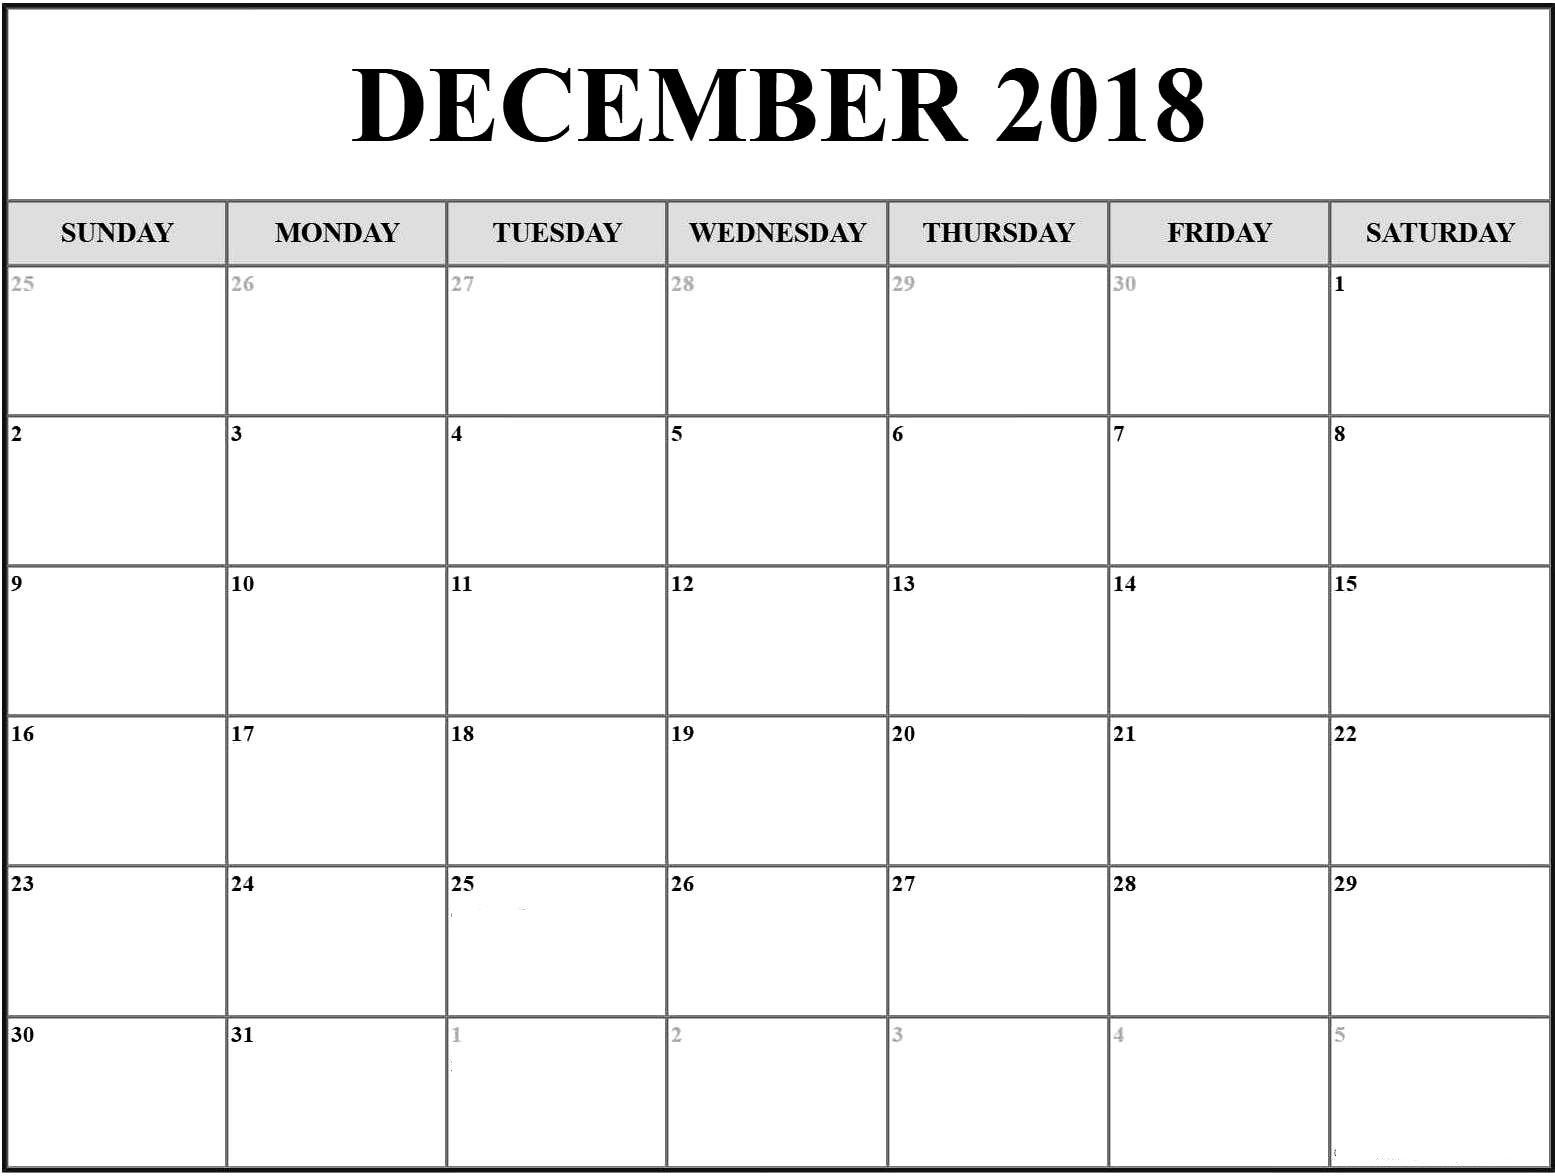 December 2018 Calendar Singapore Printable